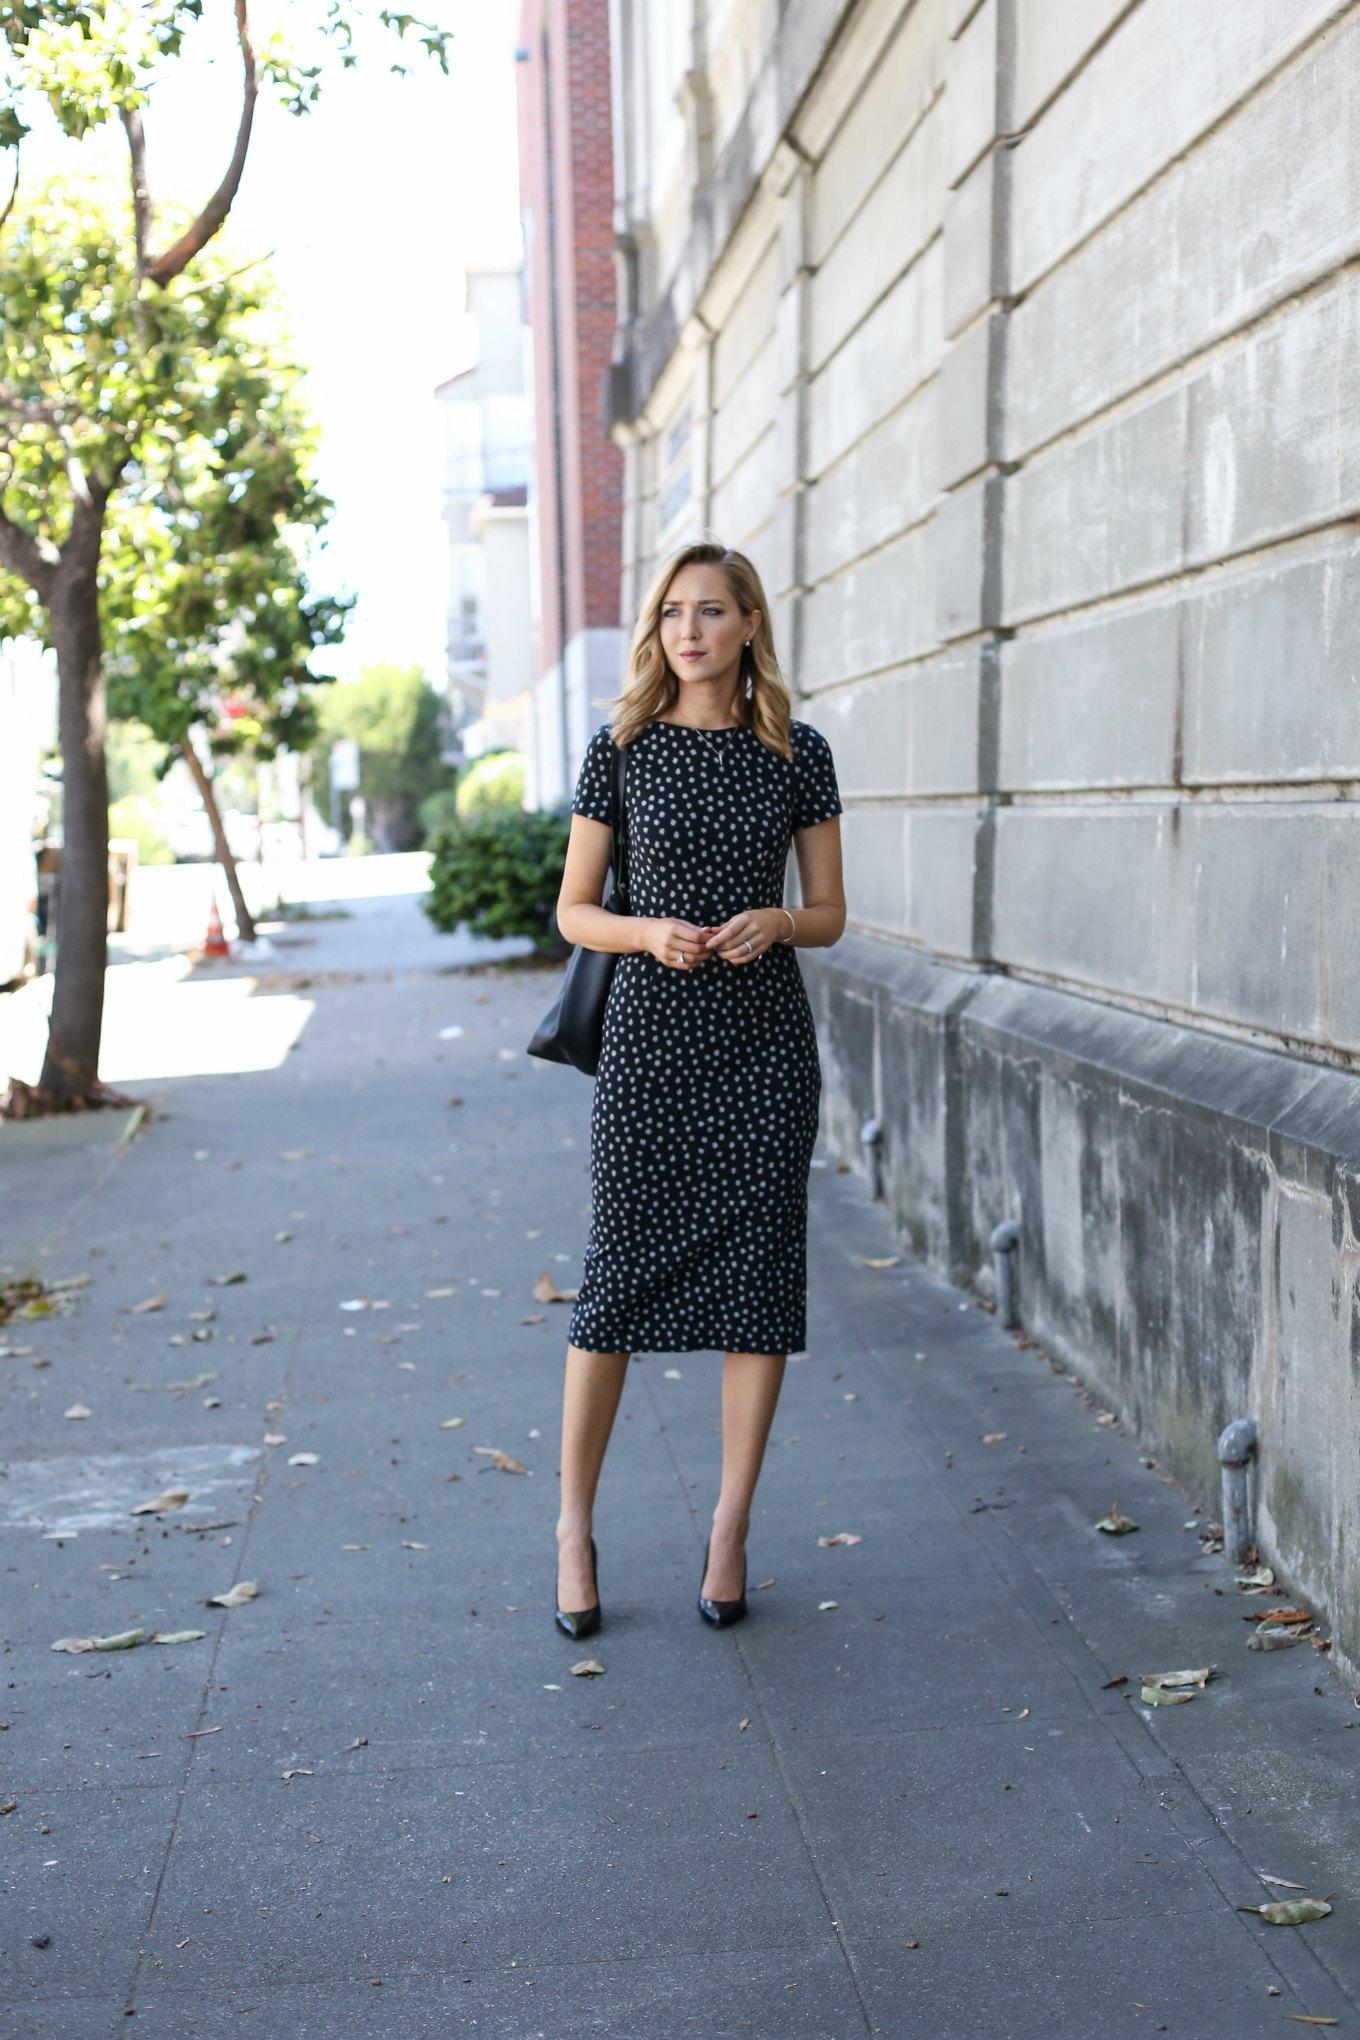 anthropologie-black-short-sleeve-sheath-dress-polka-dot-classic-work-wear-office-business-professional-women-style-fashion-(8) - Günün tarzı Benekli elbise